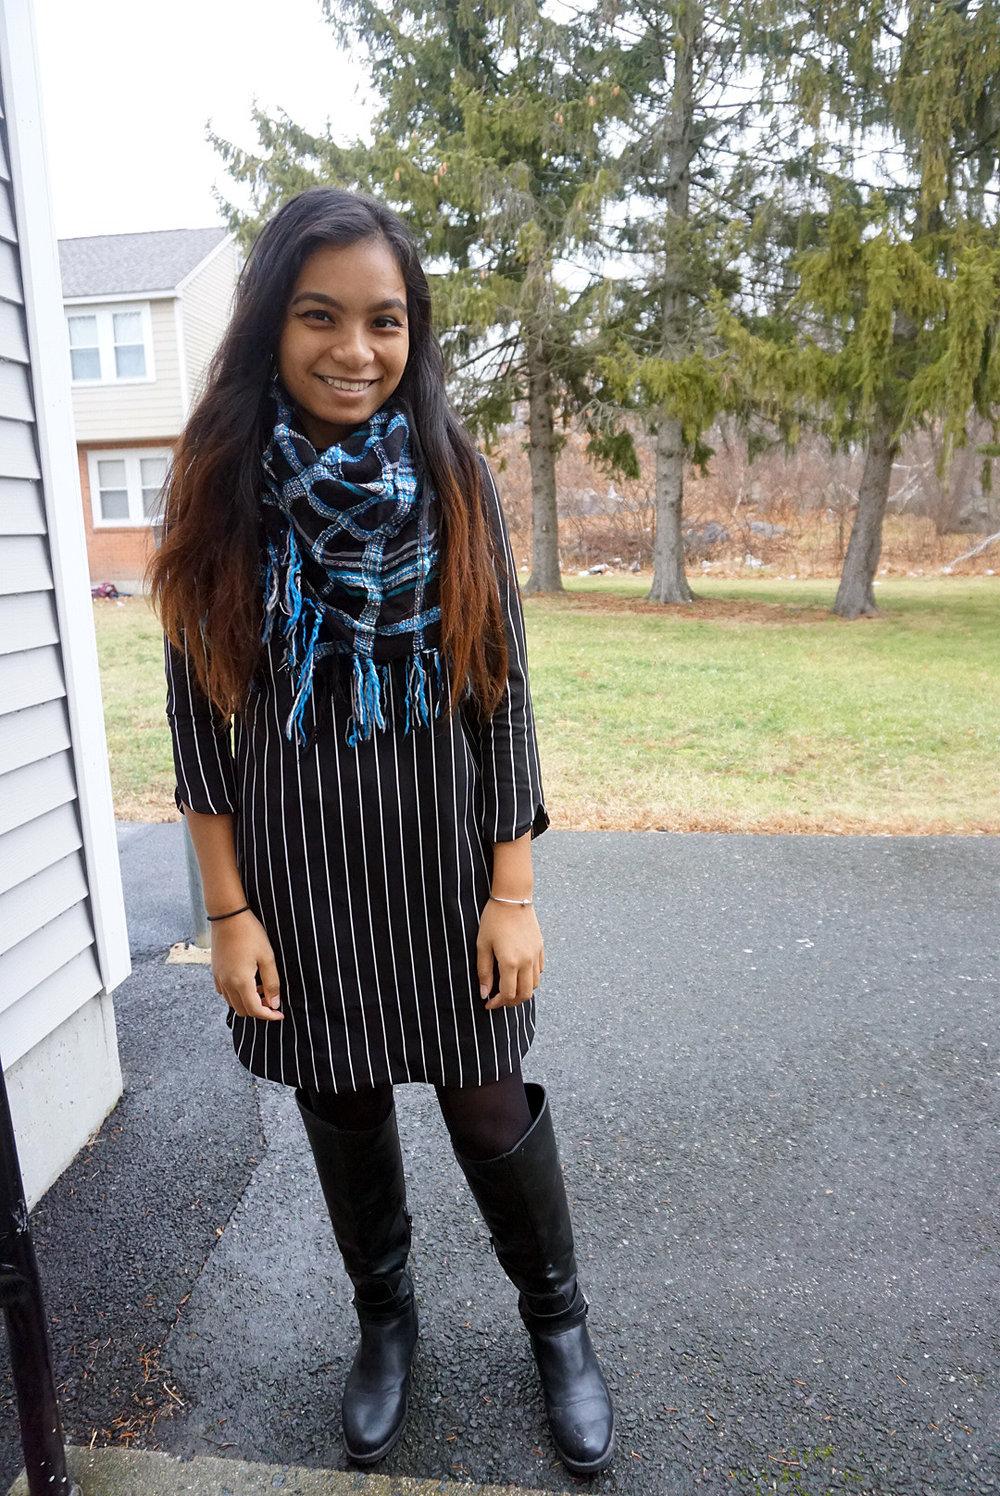 Black-White-Striped-Dress-Blogger-Style-LINDATENCHITRAN-9-1080x1616.jpg